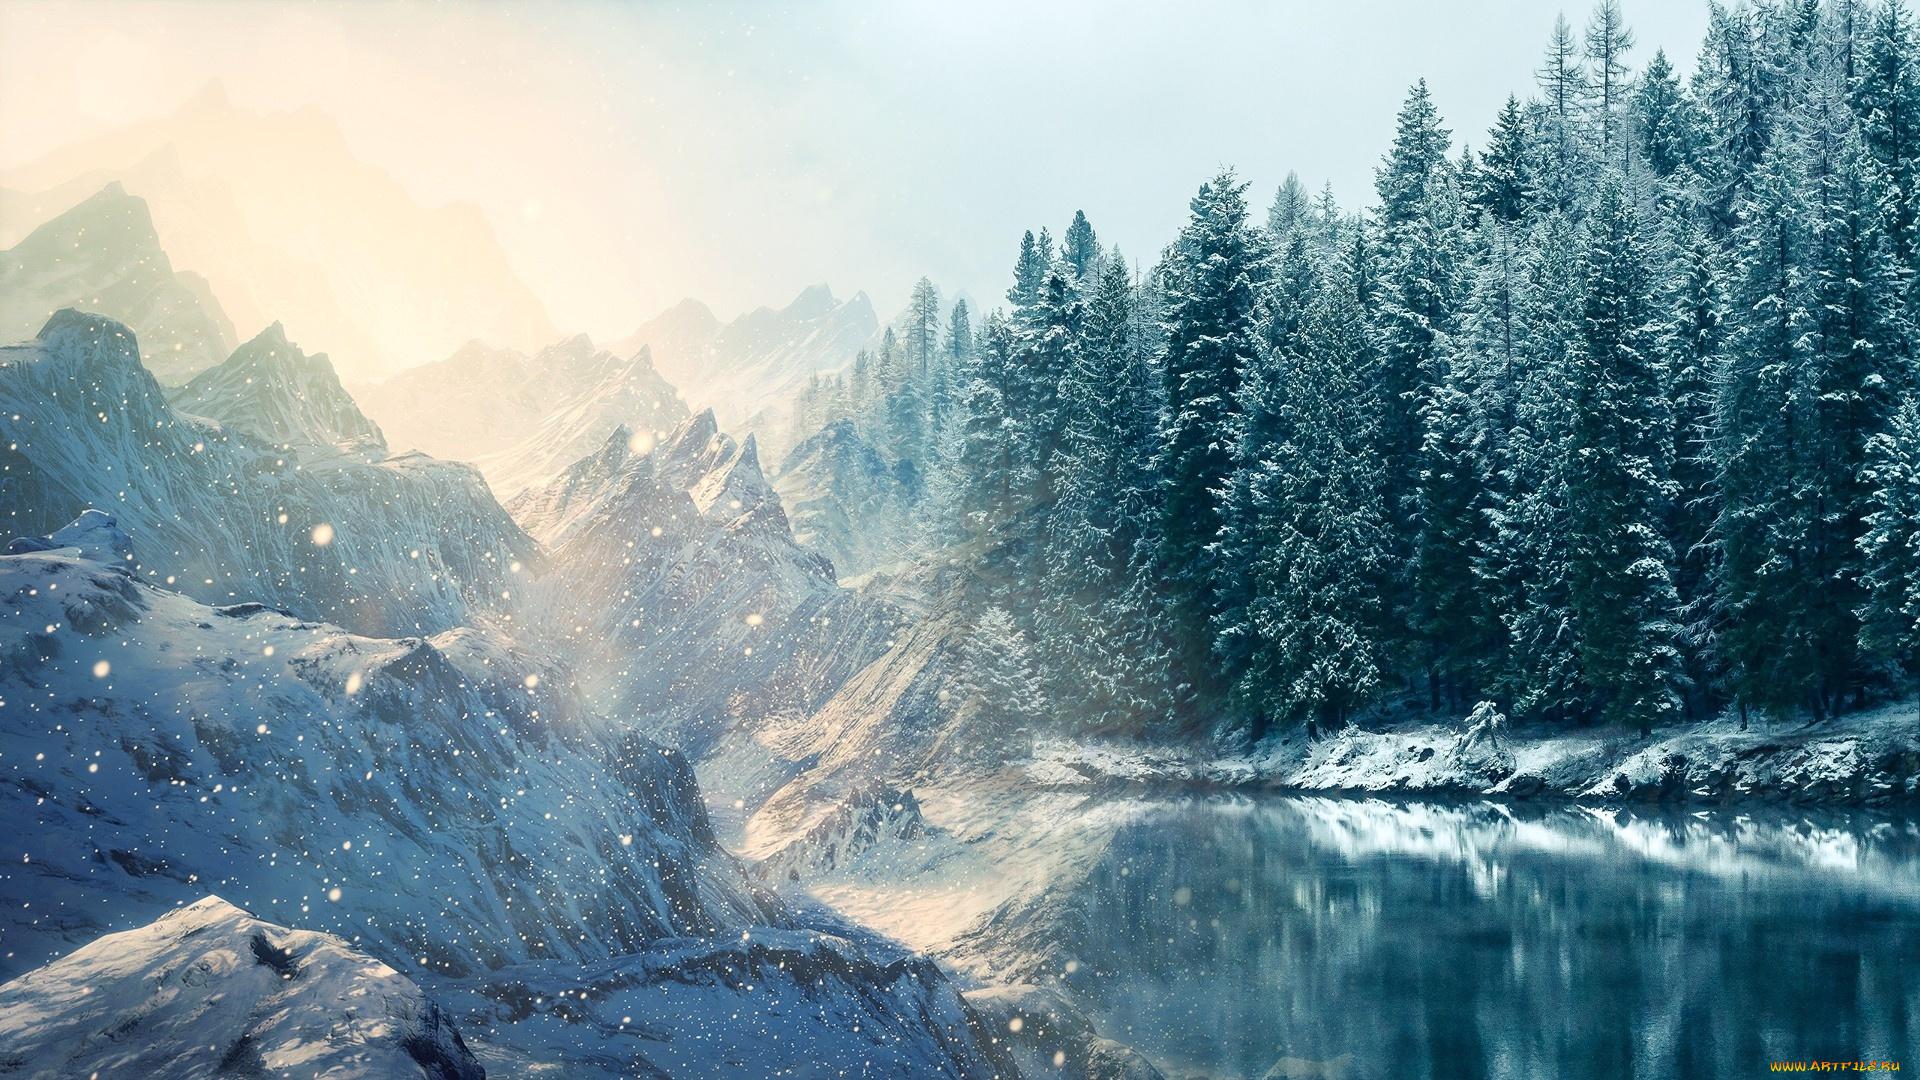 озеро горы зима снег анонимно